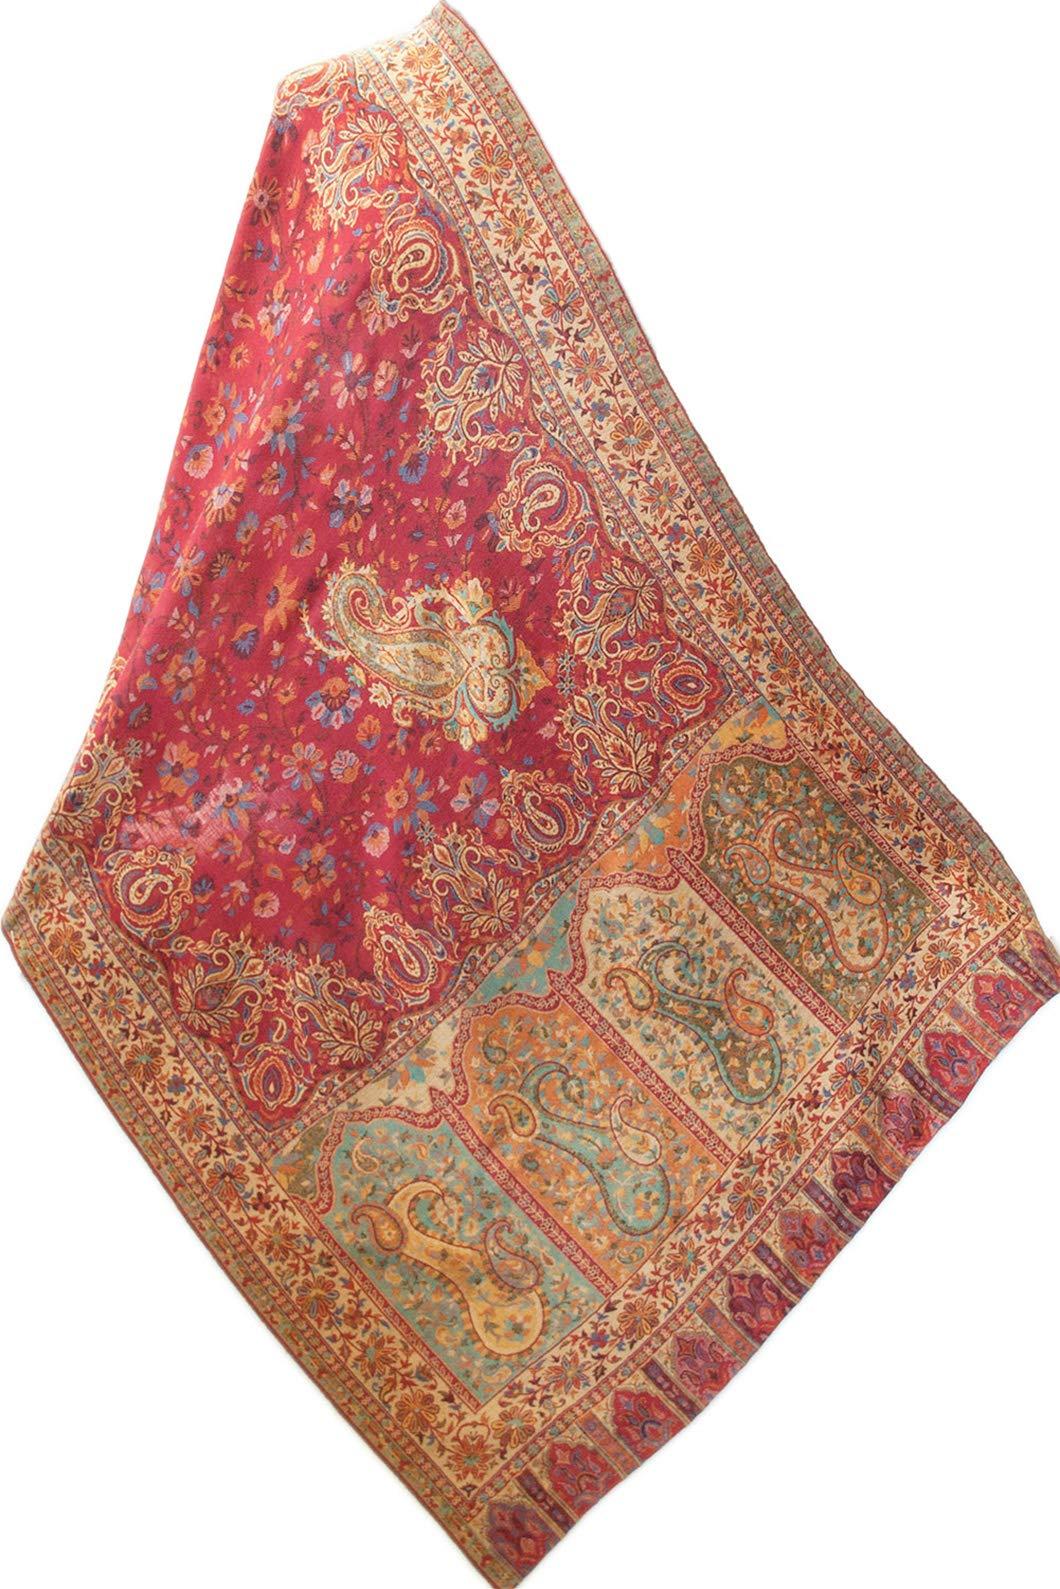 Red Wool Jamavar Floral Paisley Shawl Hand-Cut Kani Gold Pashmina 80'' x 28''